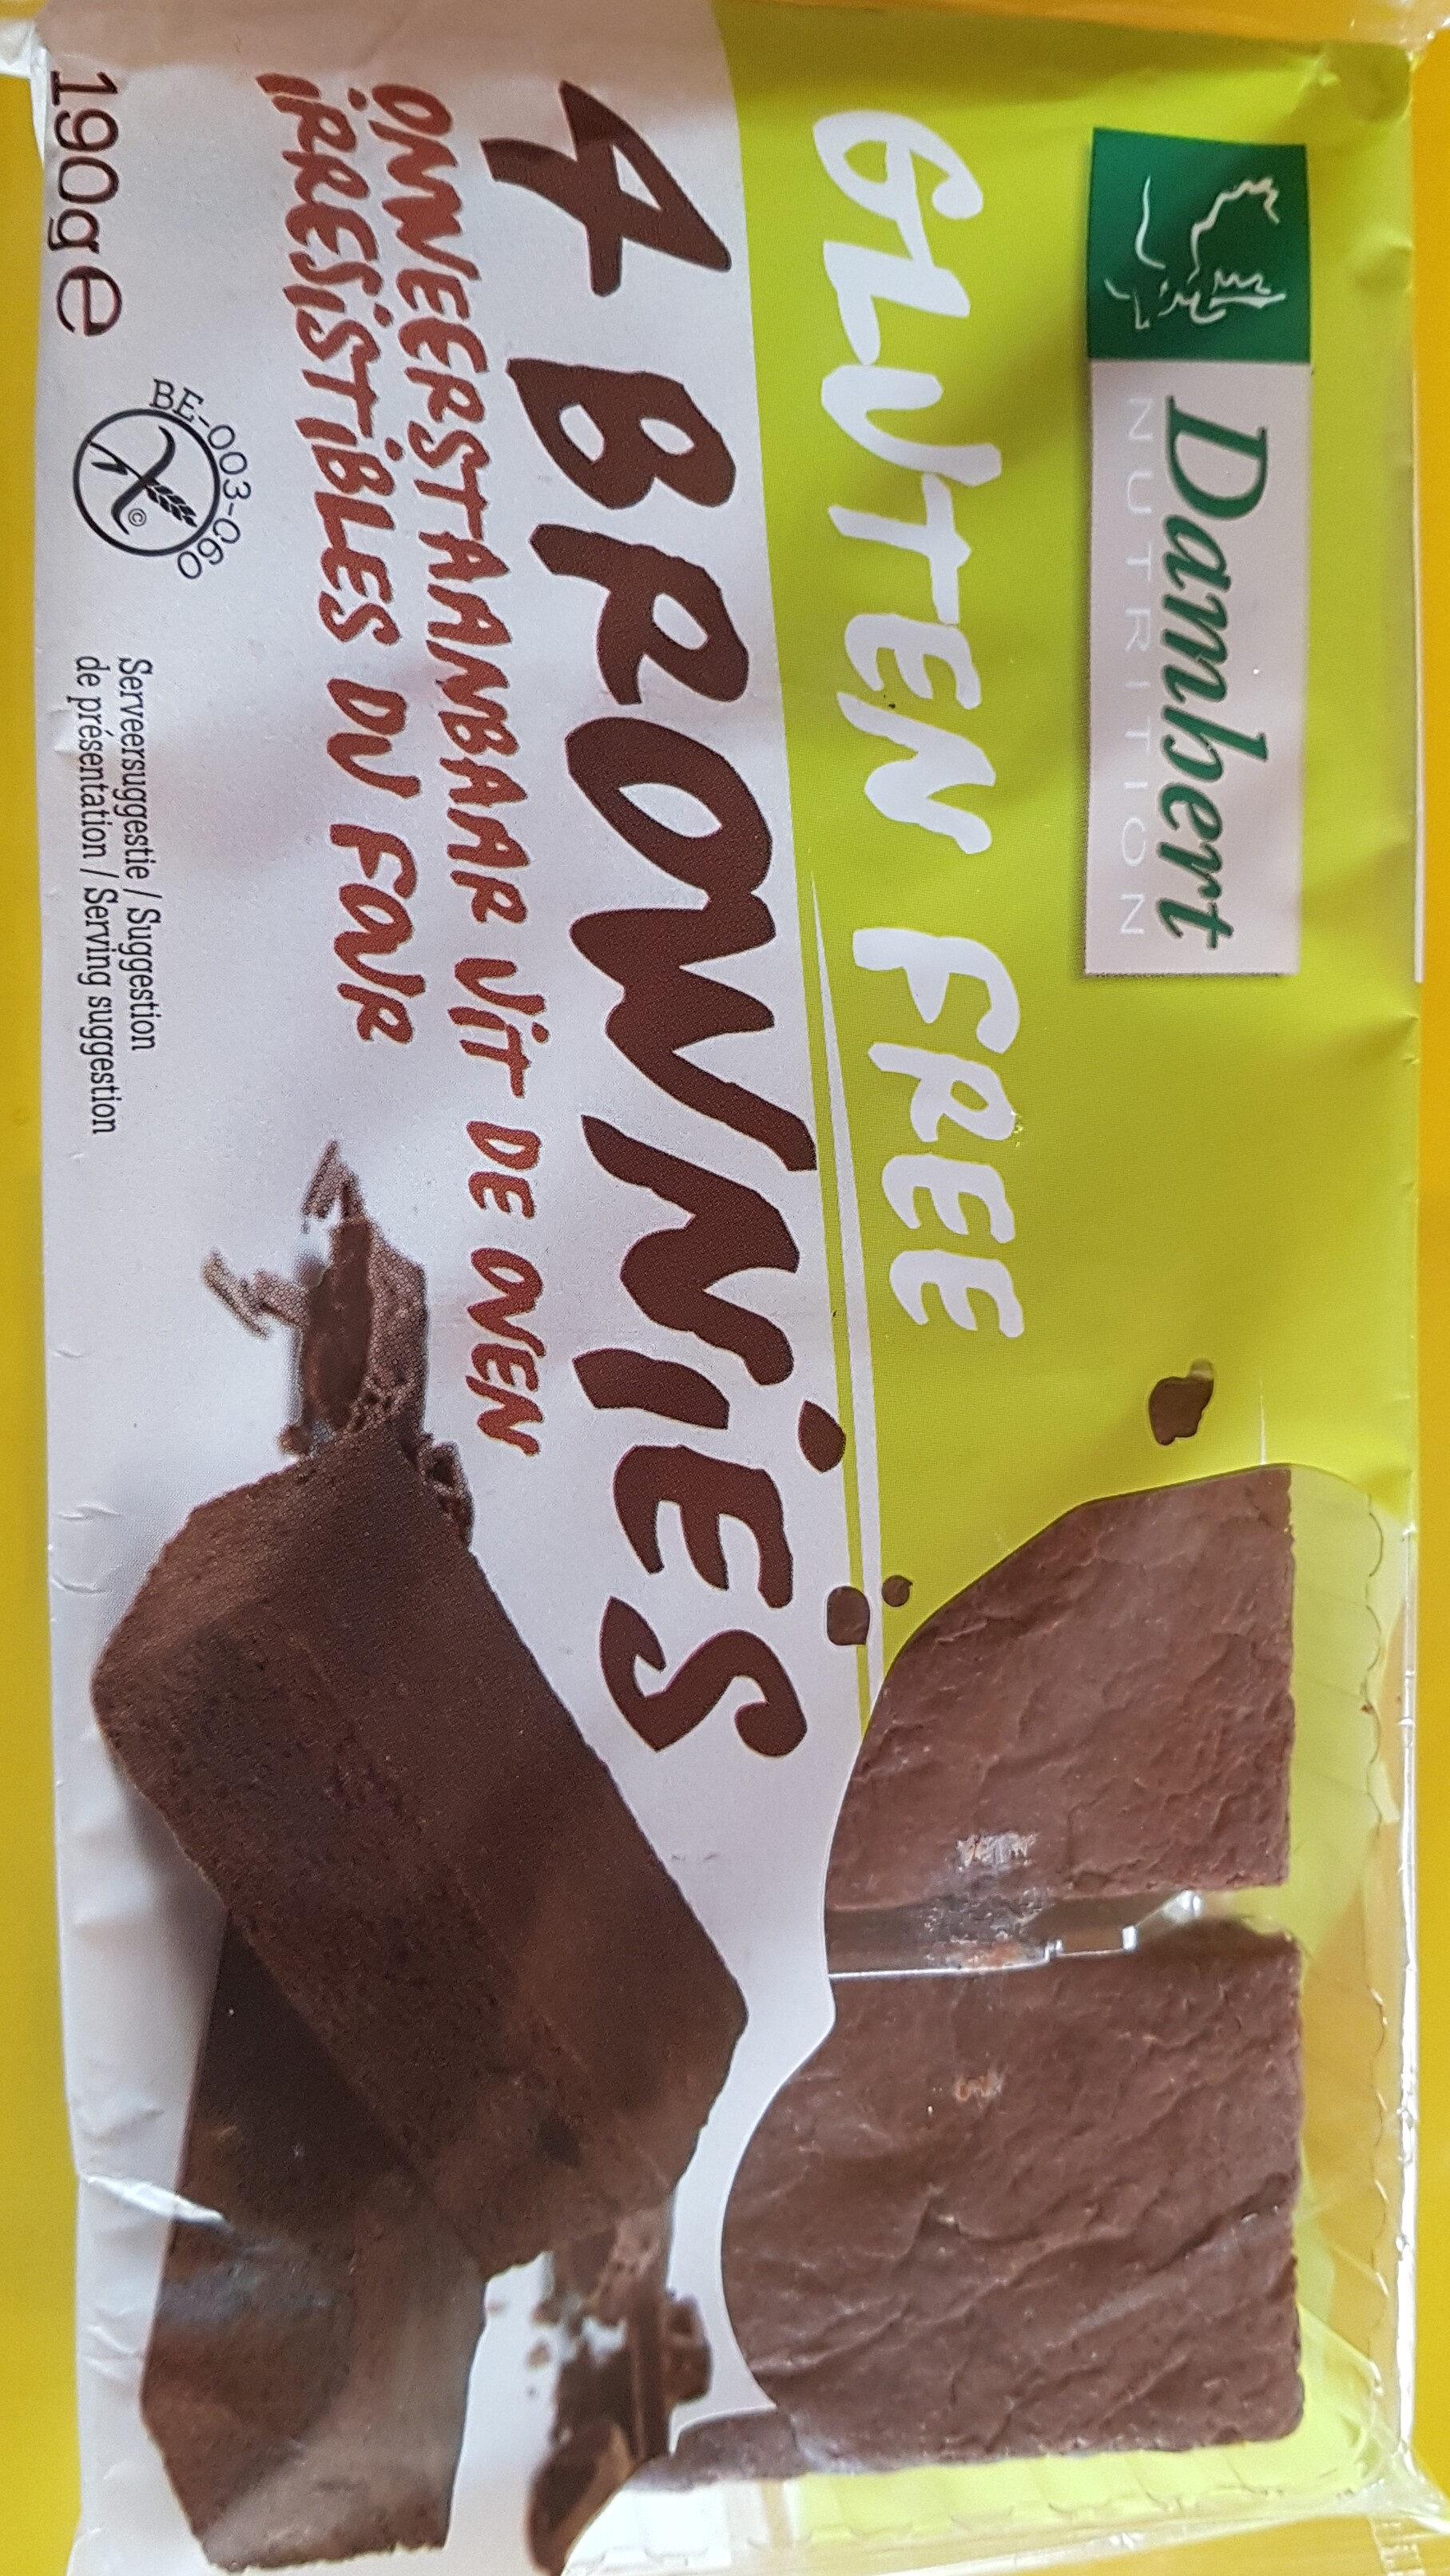 BROWNIES SANS GLUTEN - Product - fr